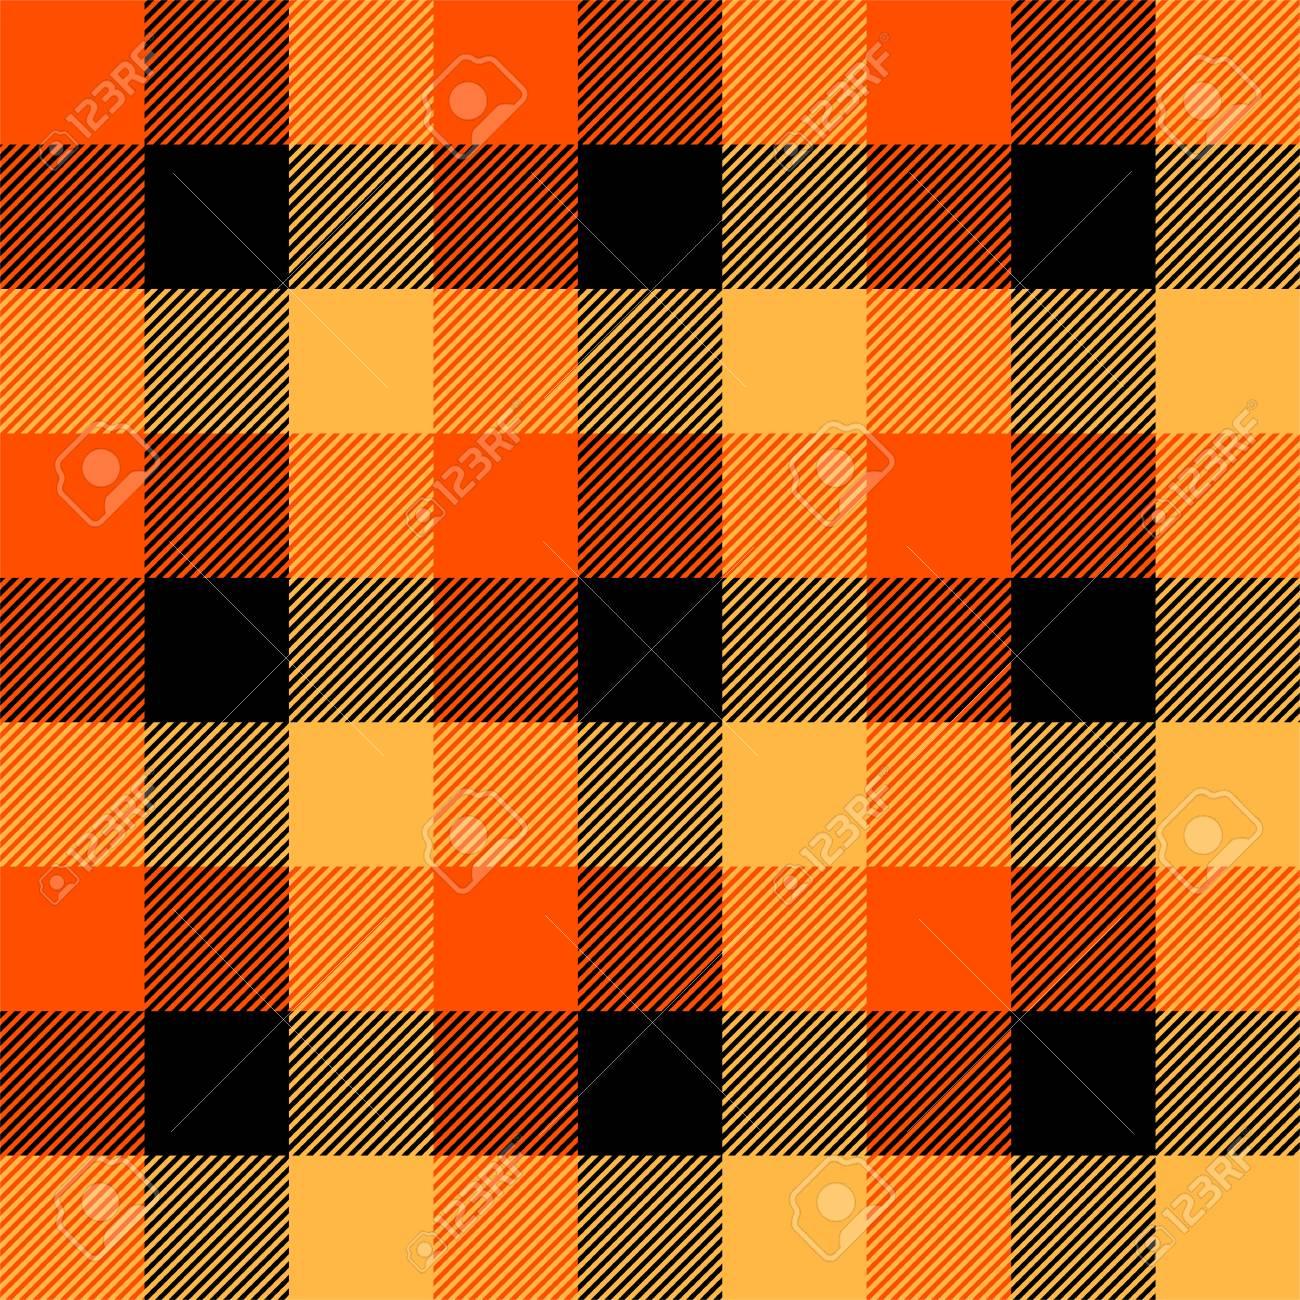 cf332bfa91 Halloween Tartan plaid. Scottish pattern in orange, black, yellow and gray  cage.